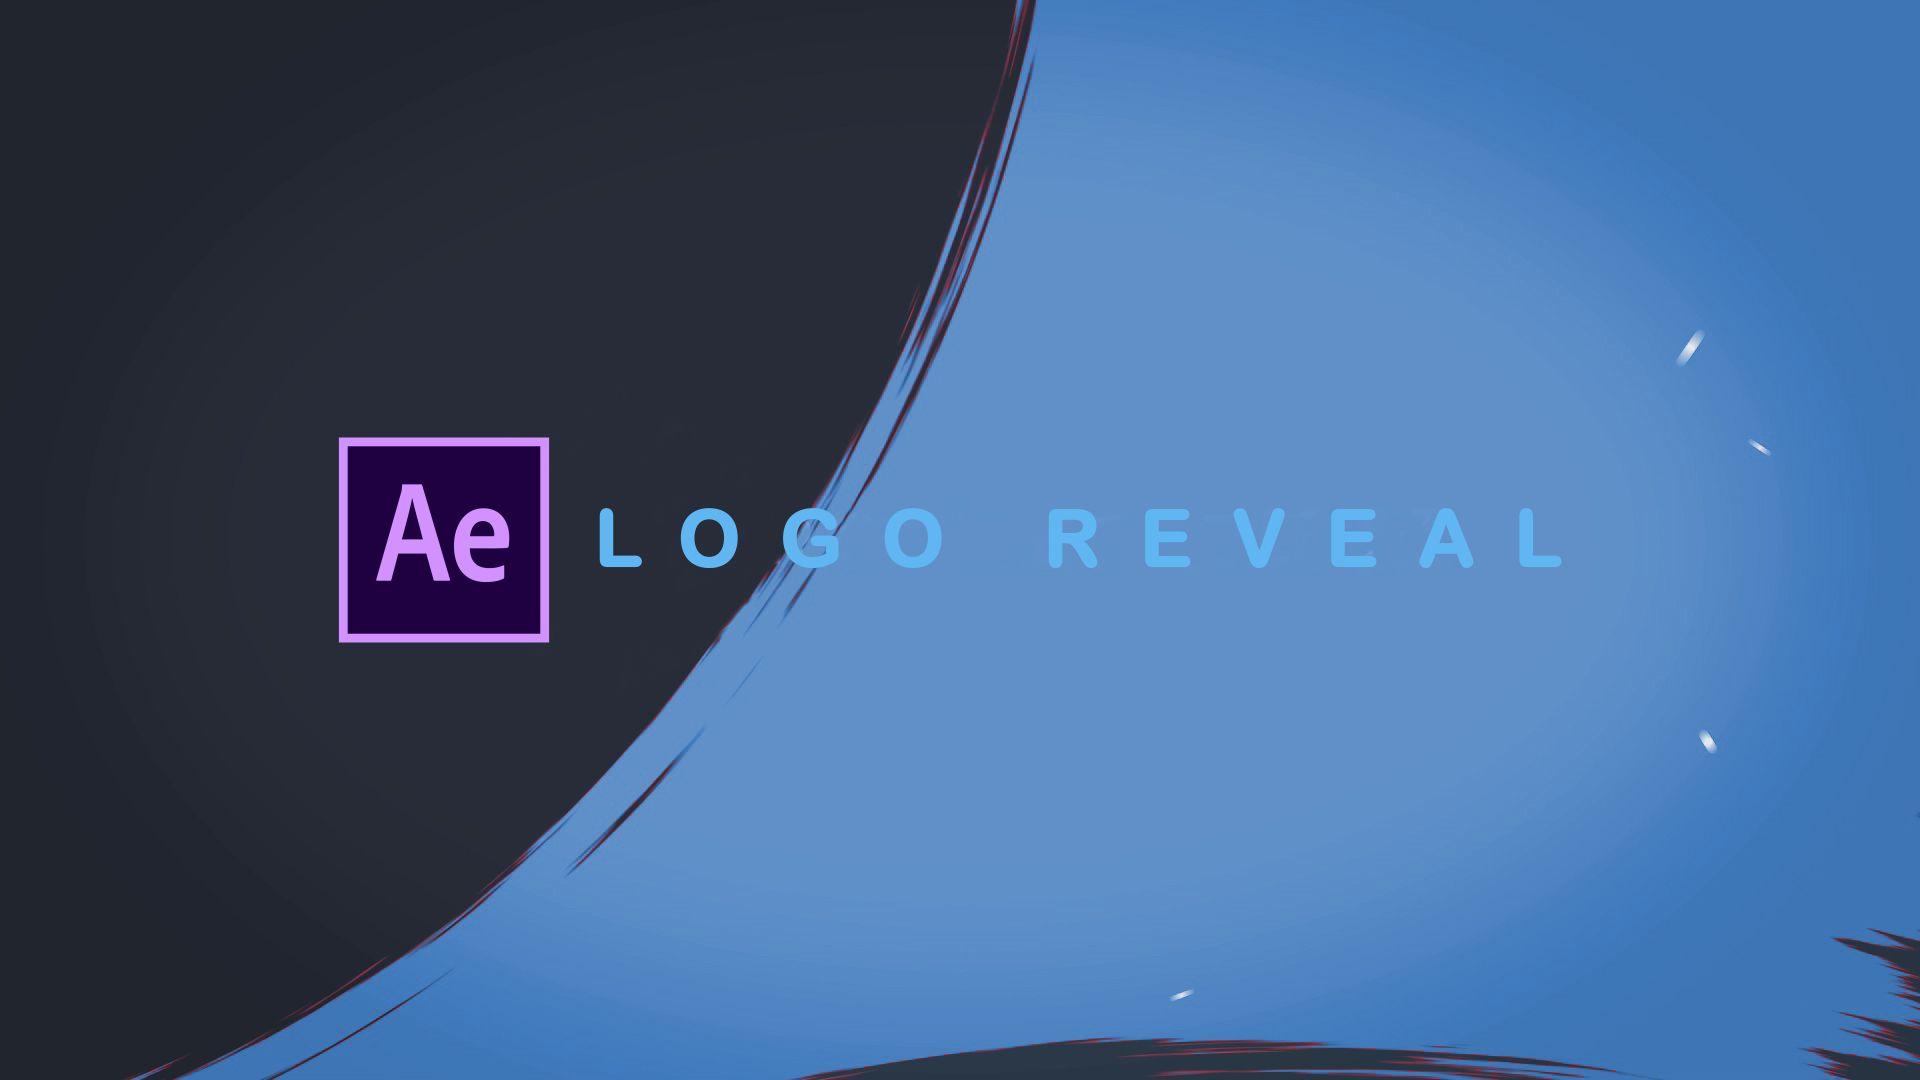 006 Shocking Adobe After Effect Logo Template Free Download Sample  Cs6 Wedding Invitation Cs5 IntroFull